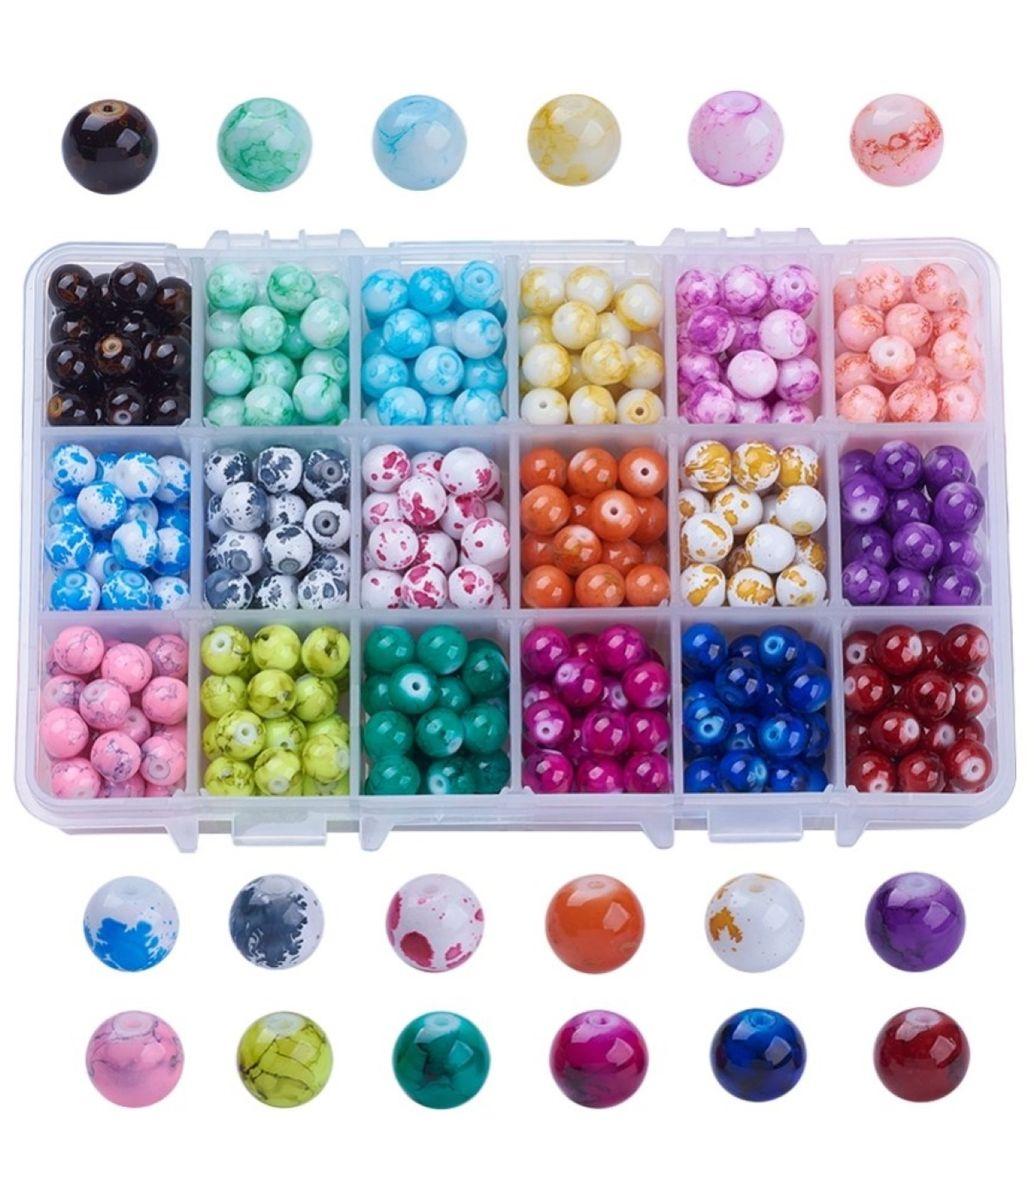 Glasperlen Set marmoriert 8mm, 1 Box, ca. 500 Stück, 18 verschiedene Farben